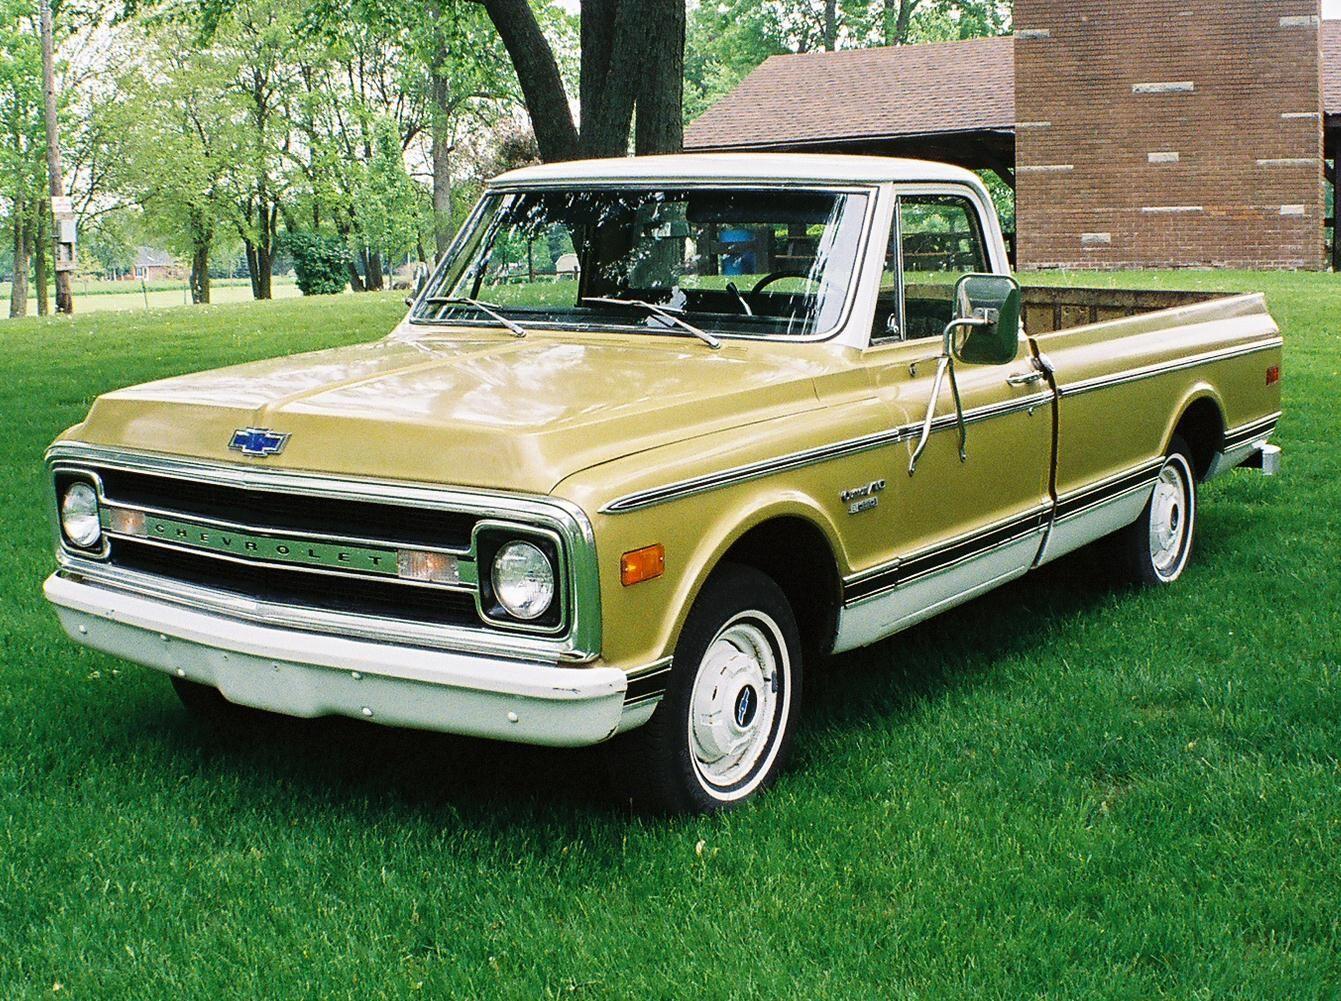 1970 Chevrolet Classic trucks, Chevy trucks, Classic